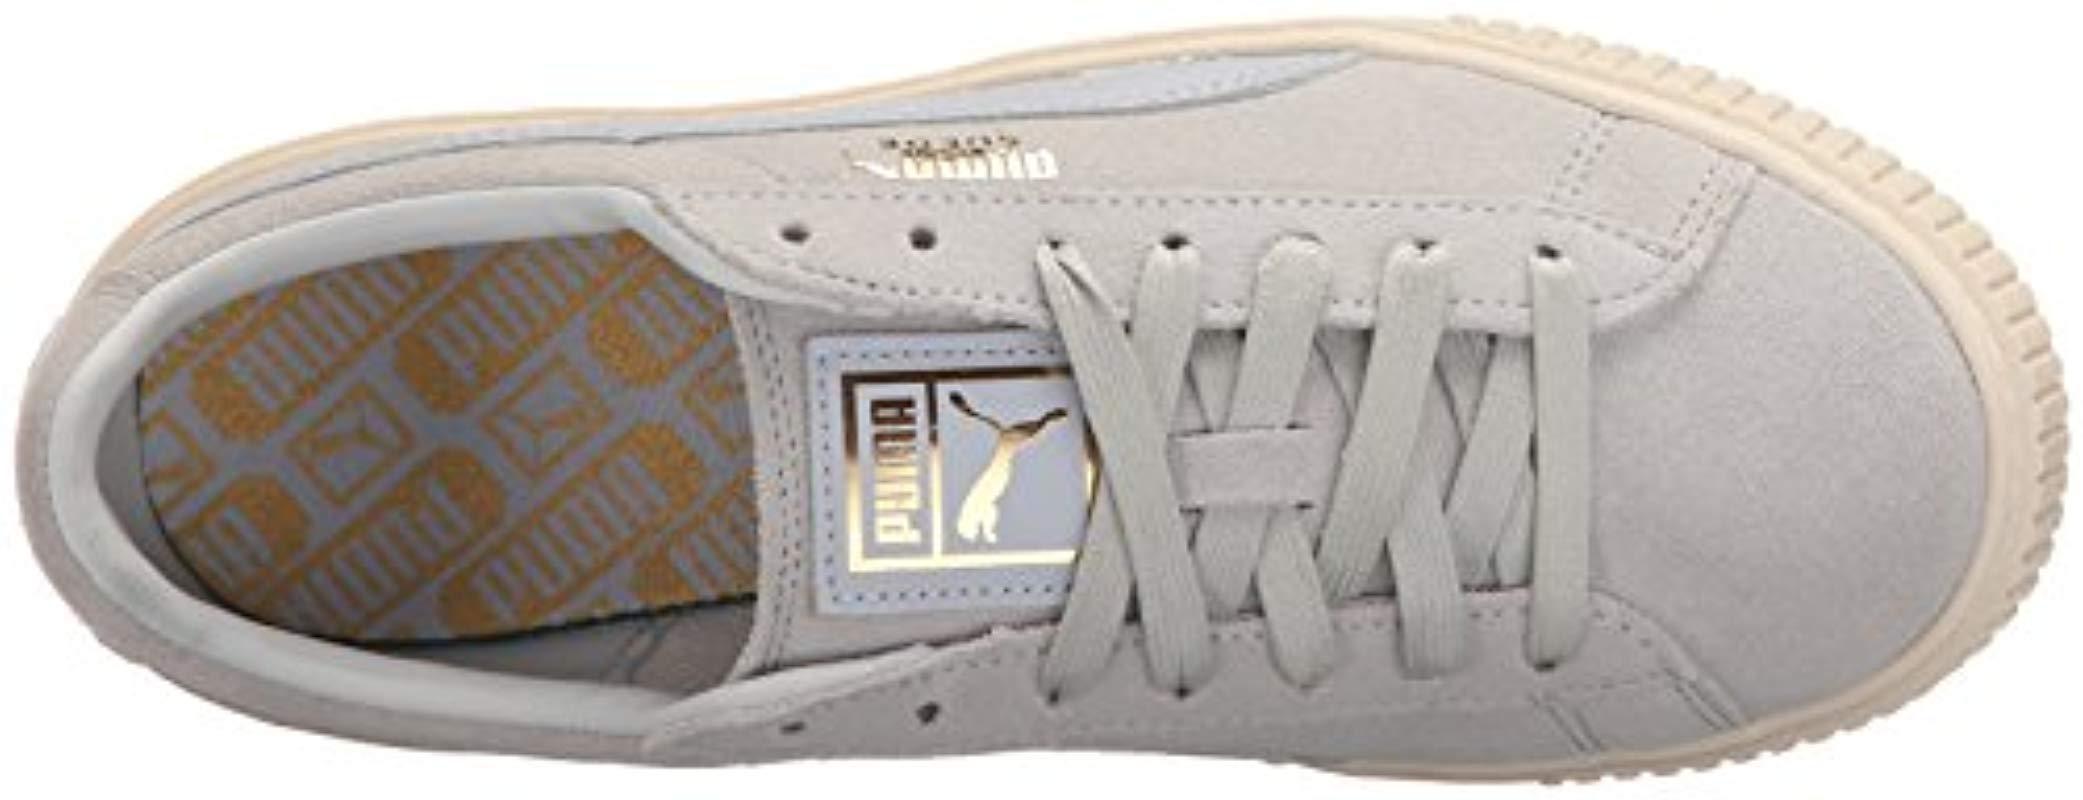 7dbfca99bb1 PUMA - Multicolor Suede Platform Core Fashion Sneaker - Lyst. View  fullscreen